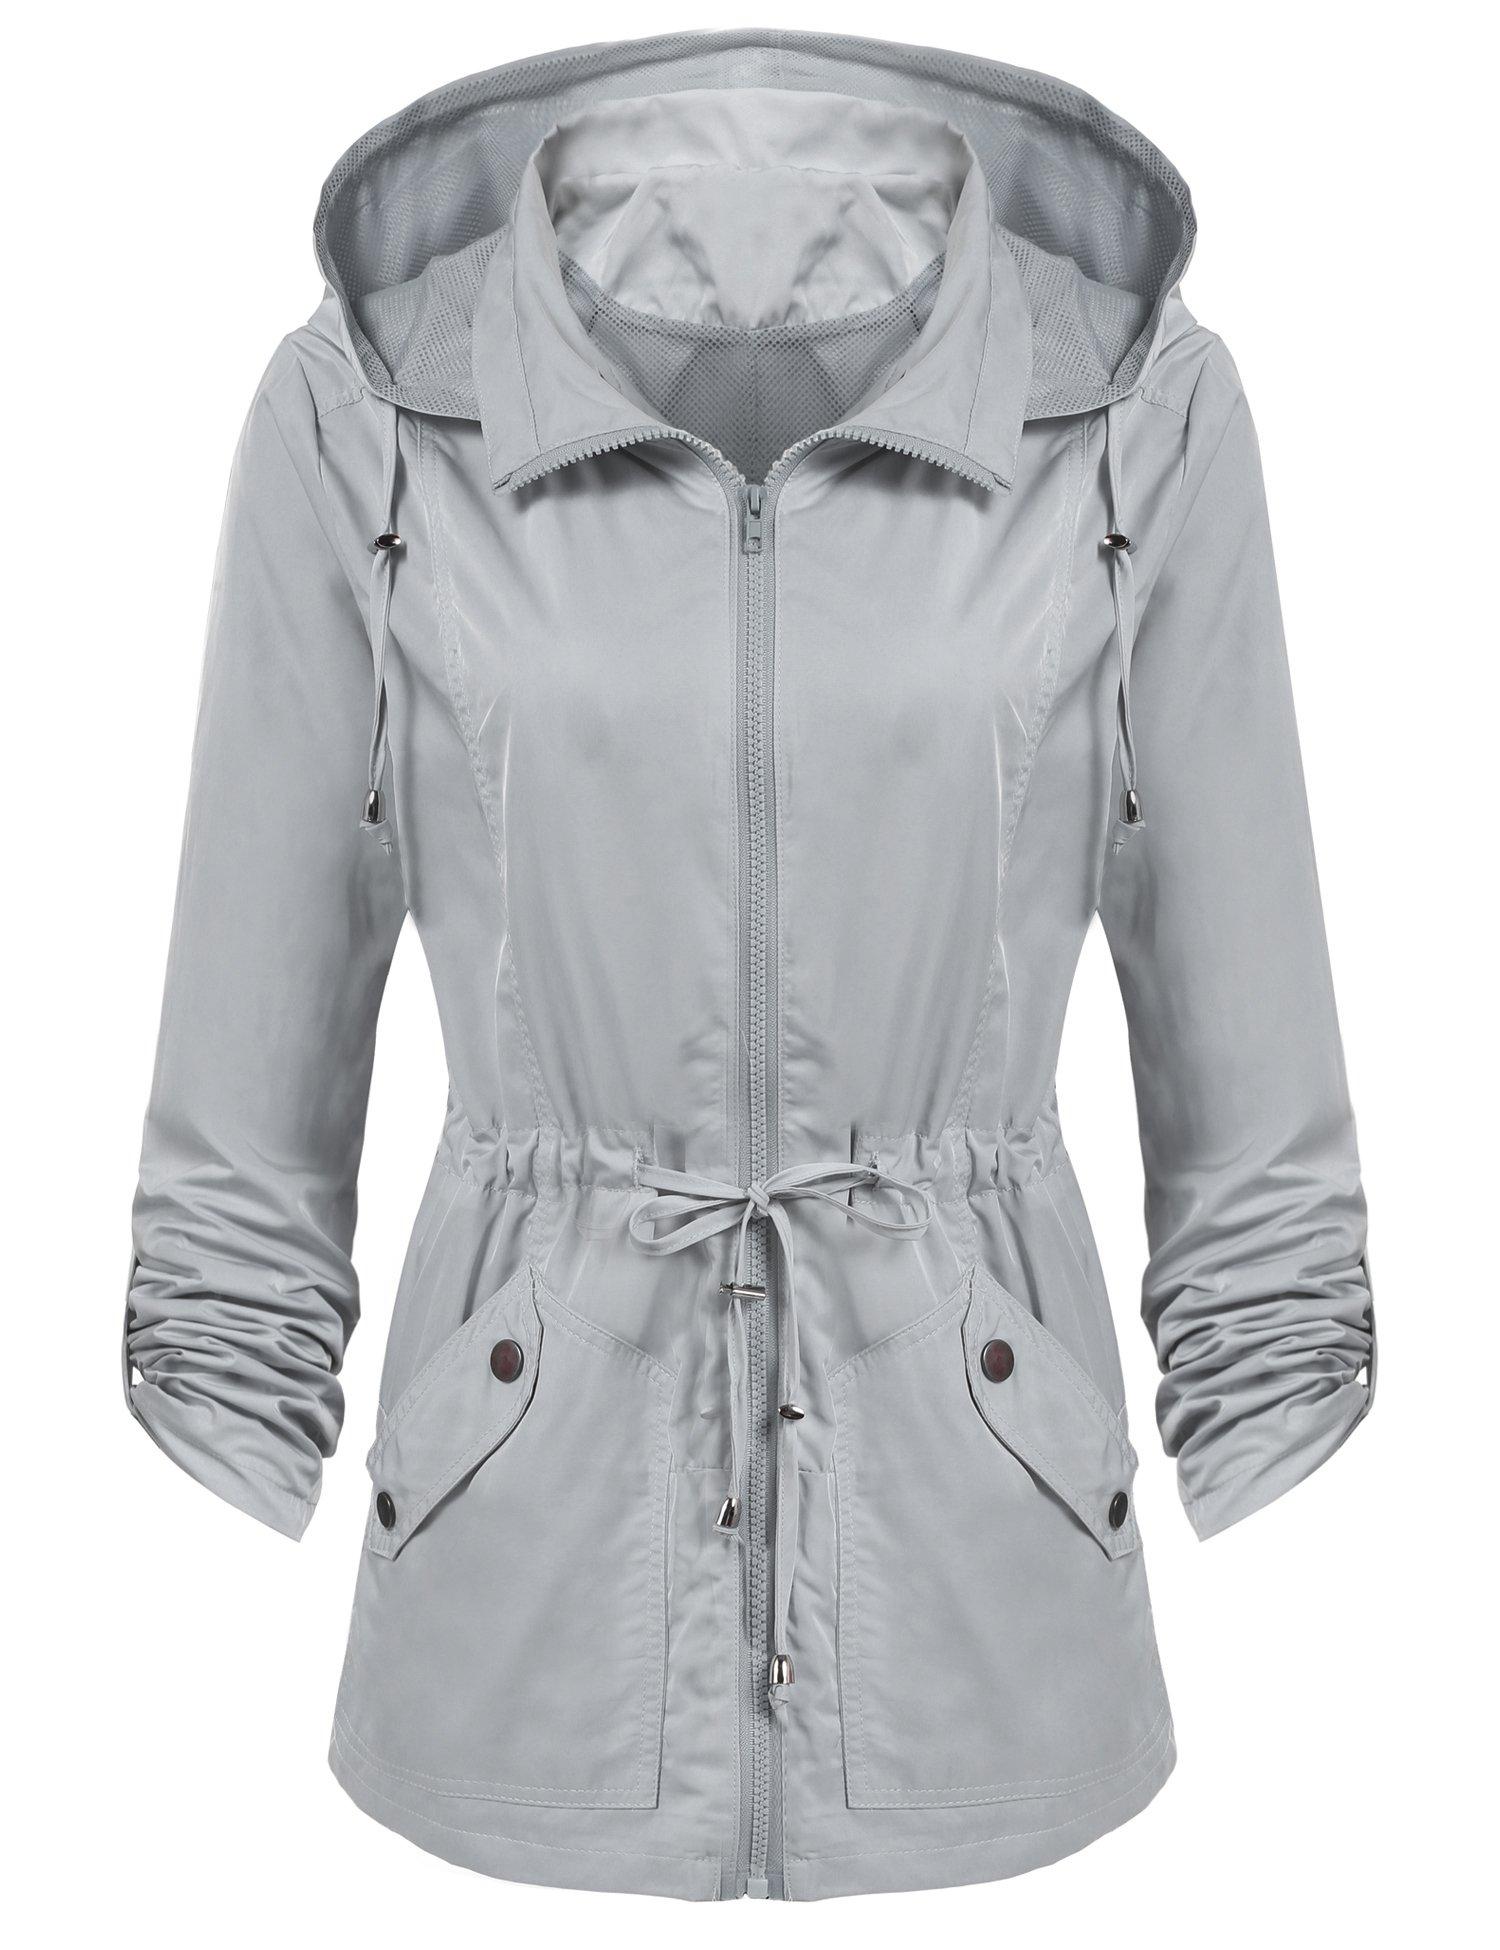 ANGVNS Women's Waterproof Lightweight Rain Jacket Anorak with Detachable Hood by ANGVNS (Image #2)